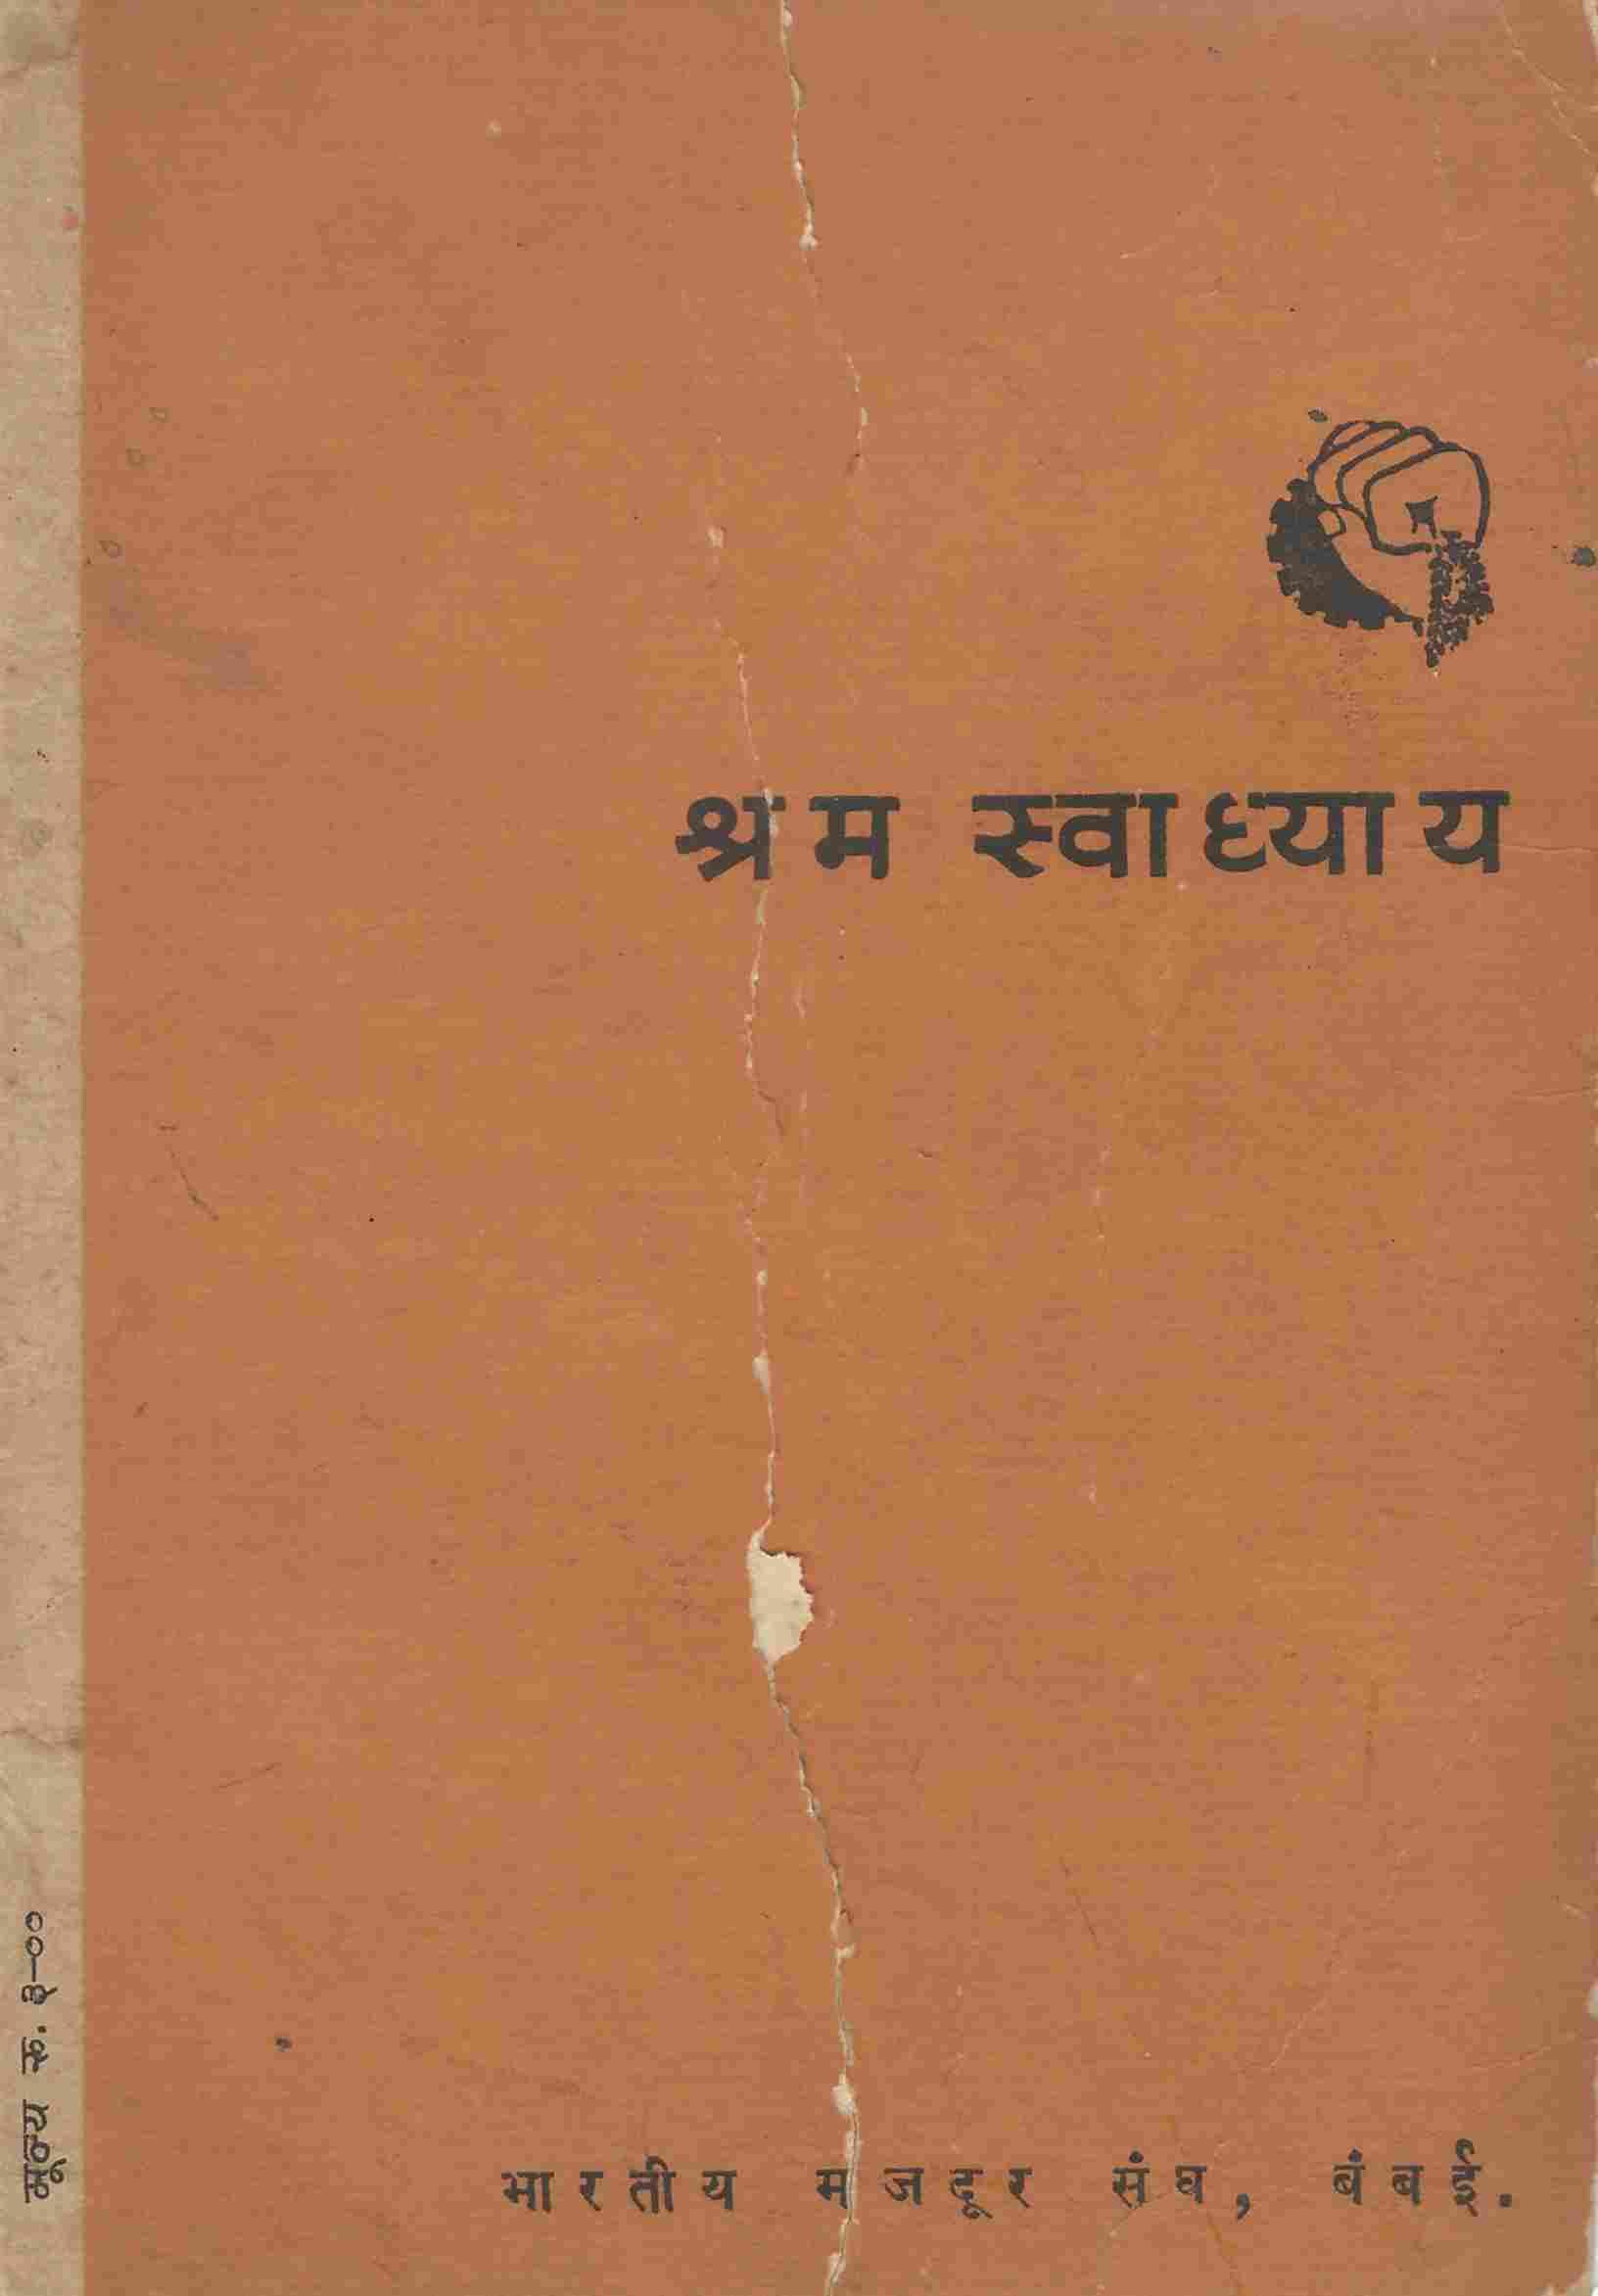 श्रम स्वाध्याय भारतीय मजदूर संघ बंबई